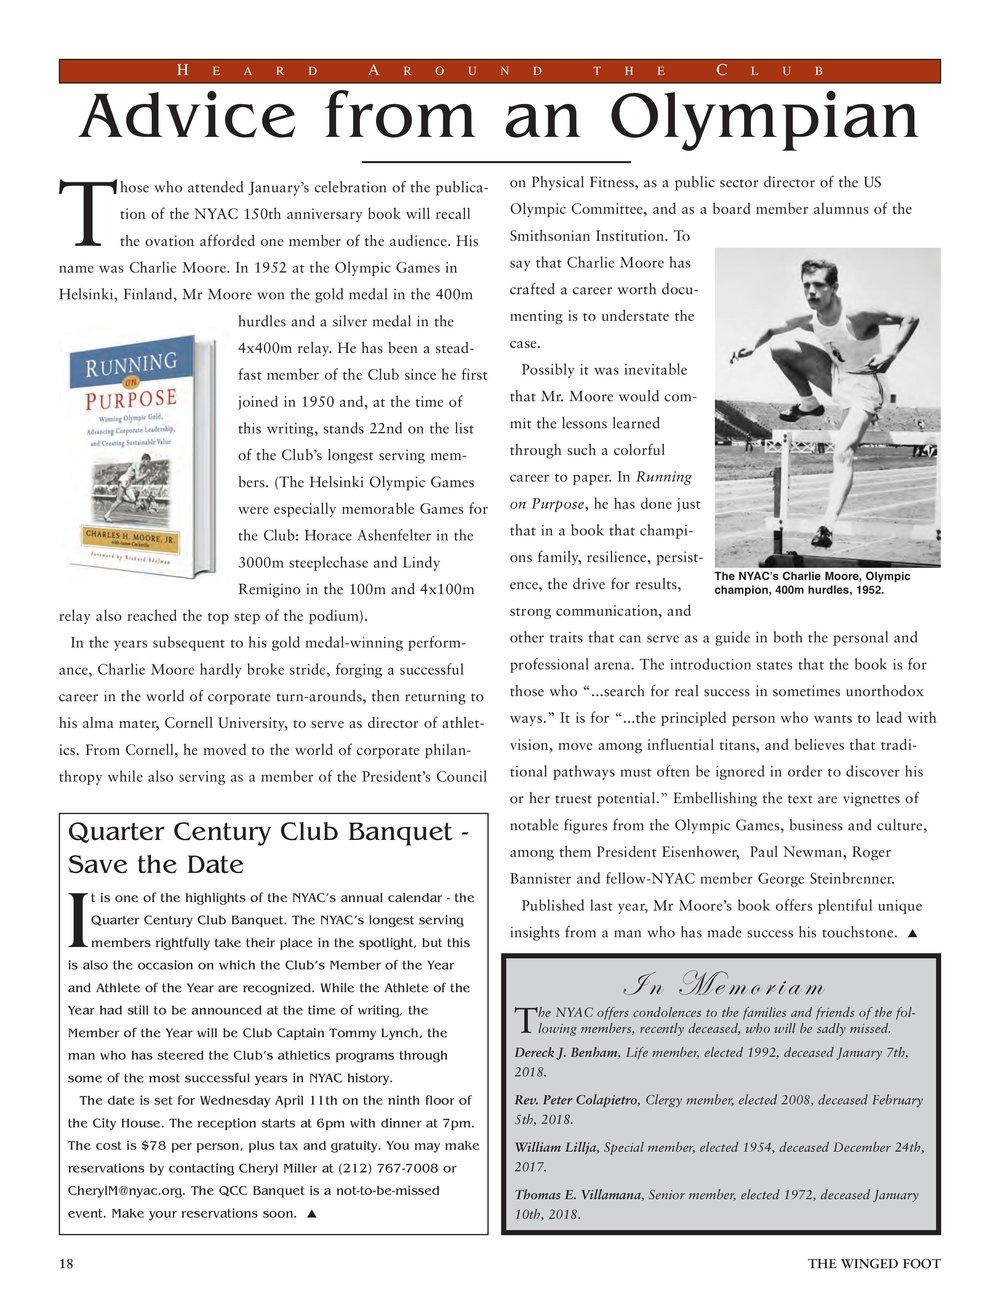 Winged Foot Article Charles Moore-page-001.jpg